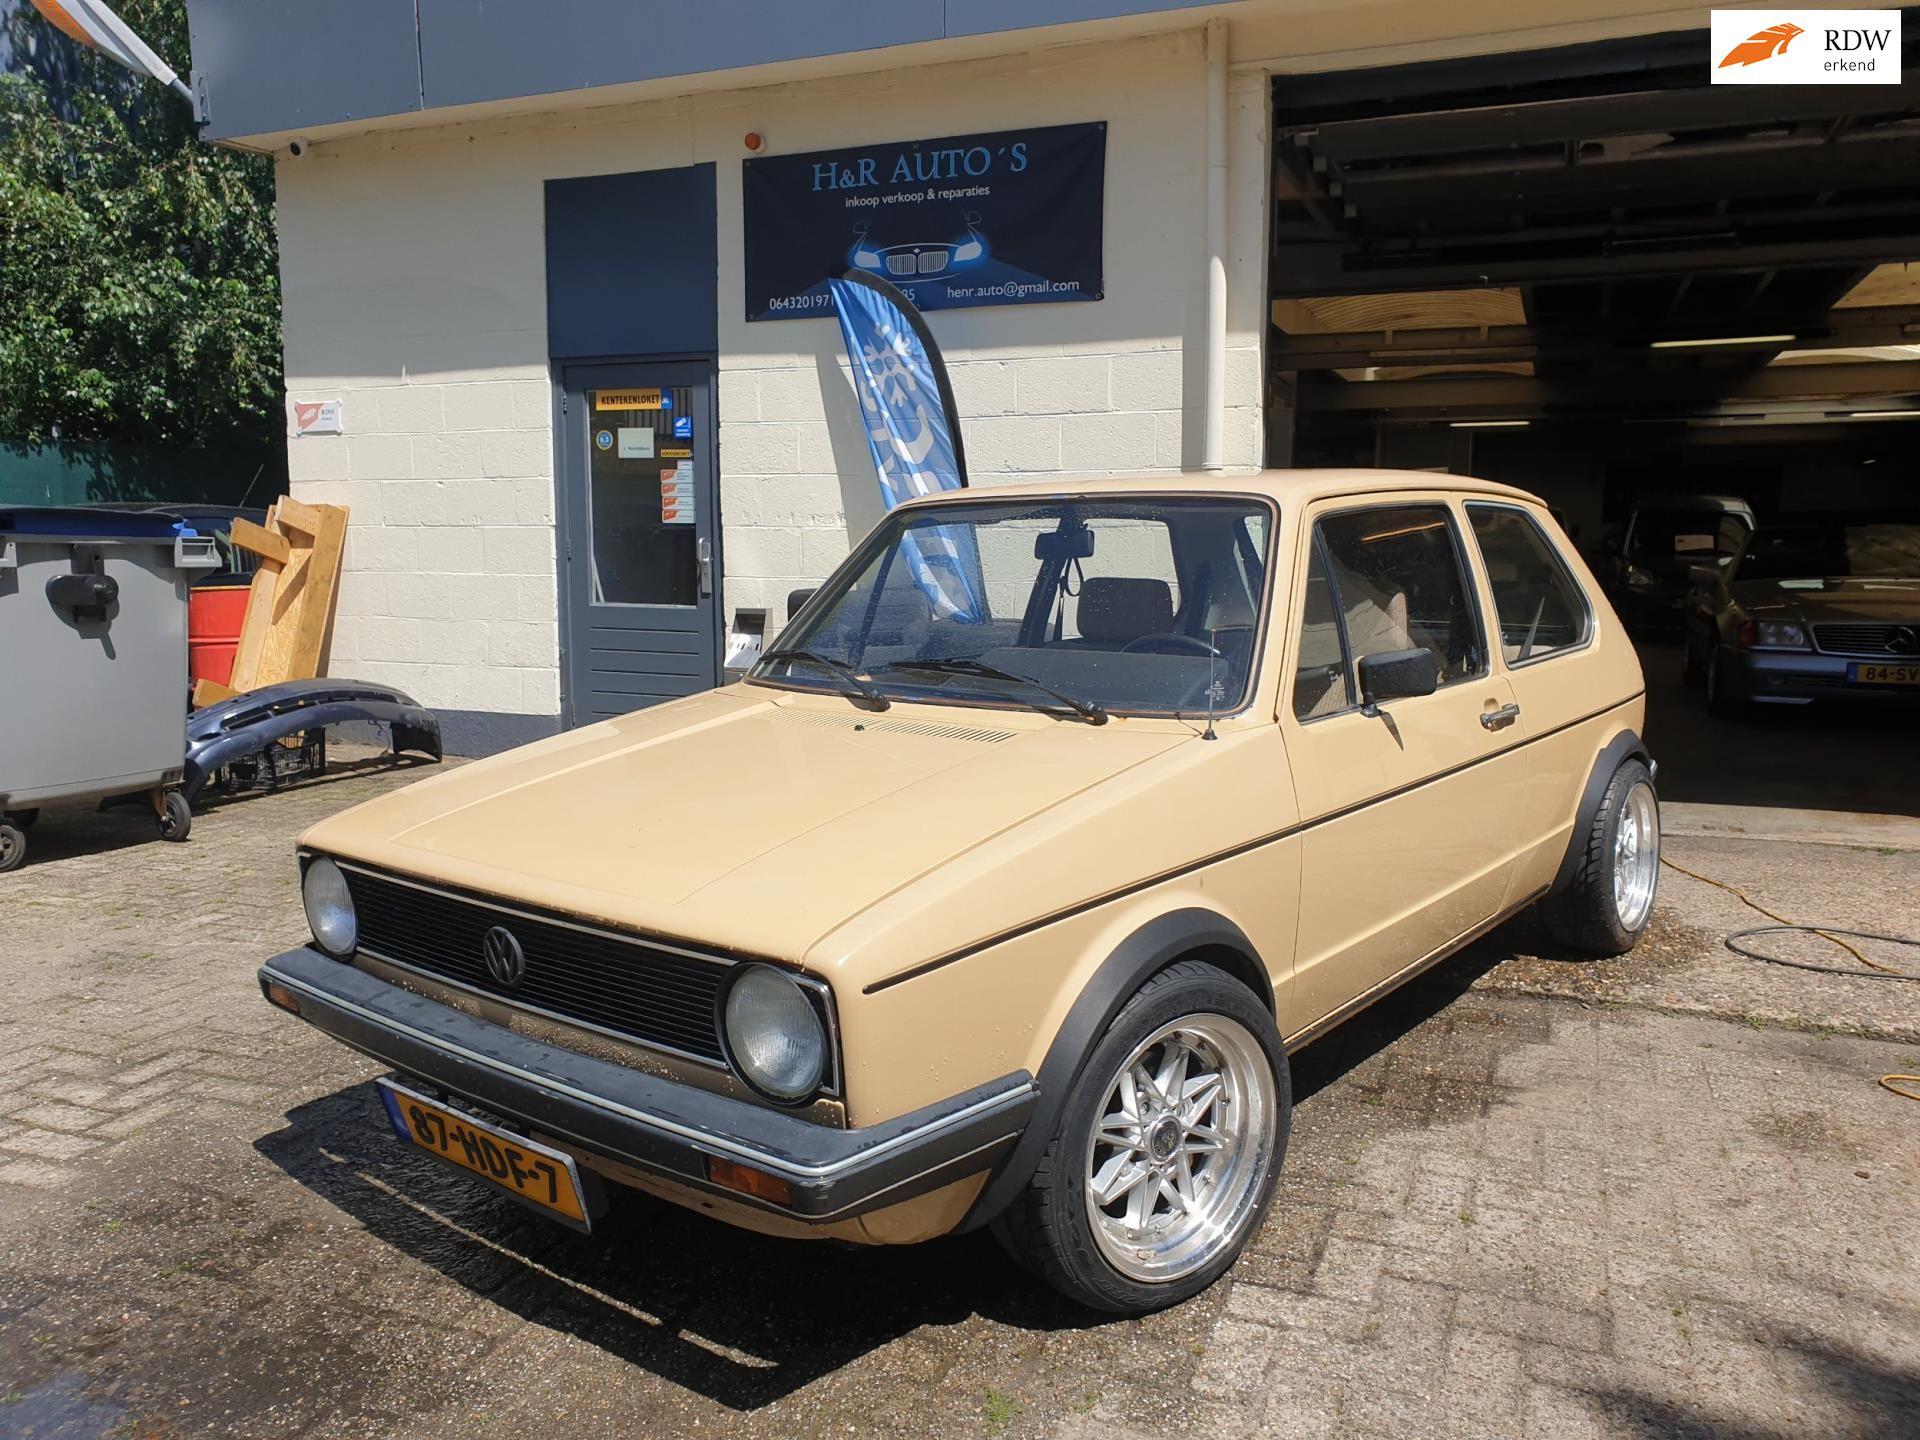 Volkswagen Golf occasion - H&R Auto's